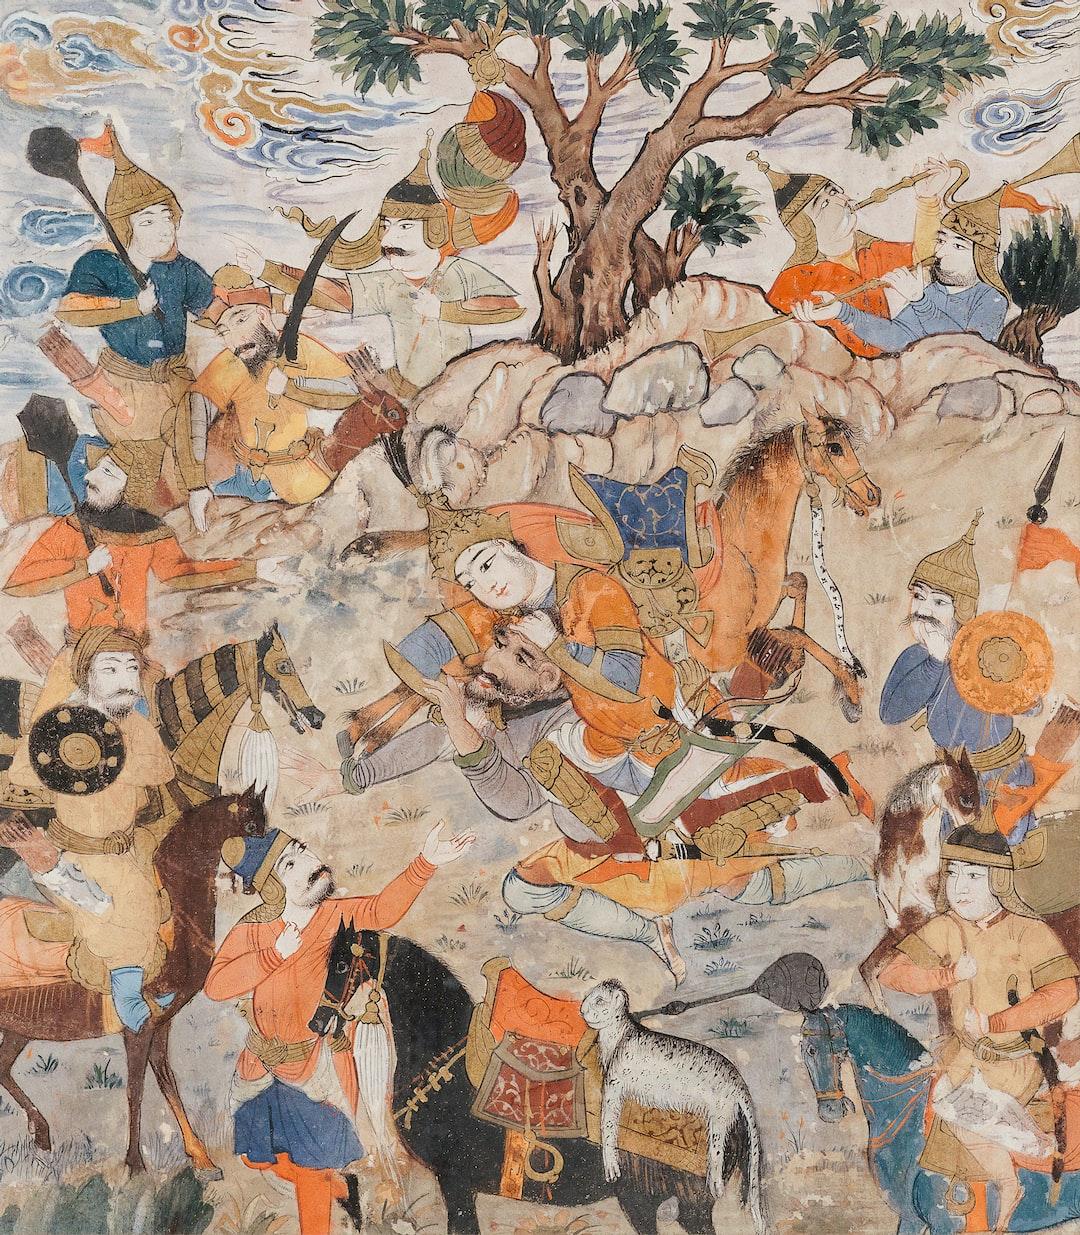 Persian Literary History. Isfandiyar kills Bidarafsh